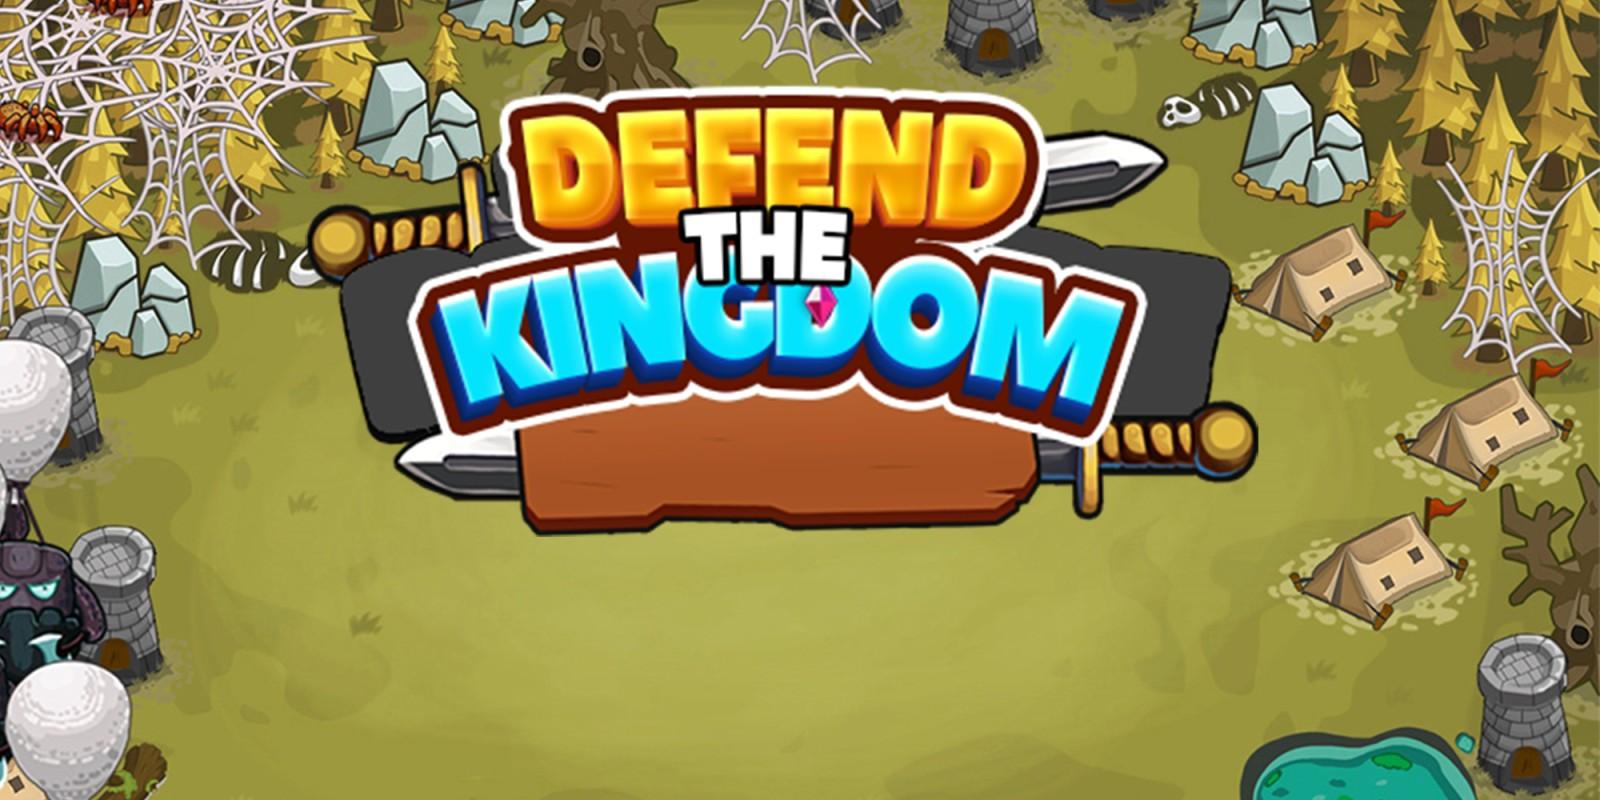 Defend the Kingdom